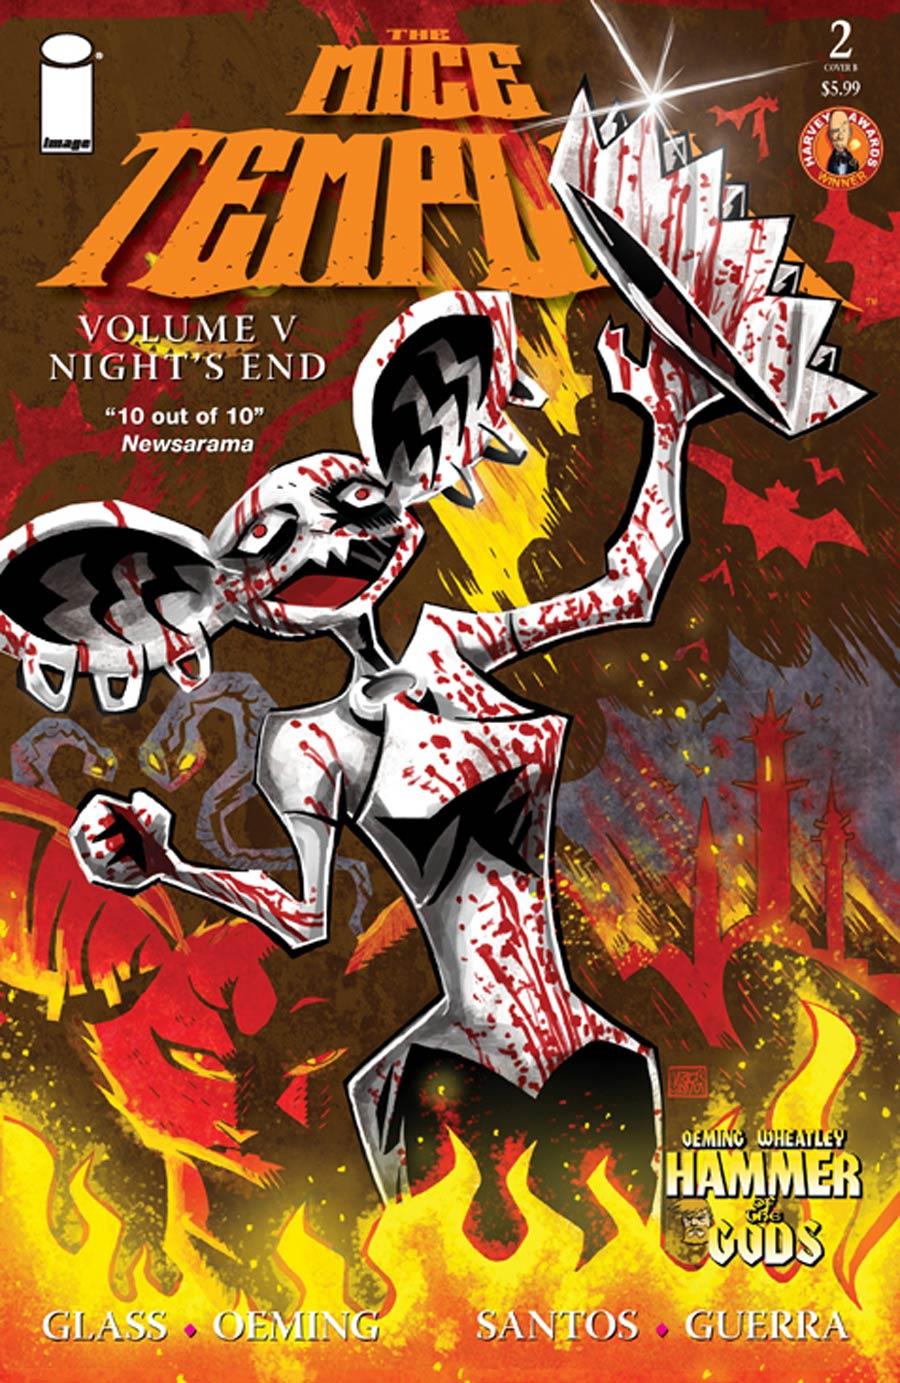 Mice Templar Vol 5 Nights End #2 Cover B Victor Santos & Chandra Free